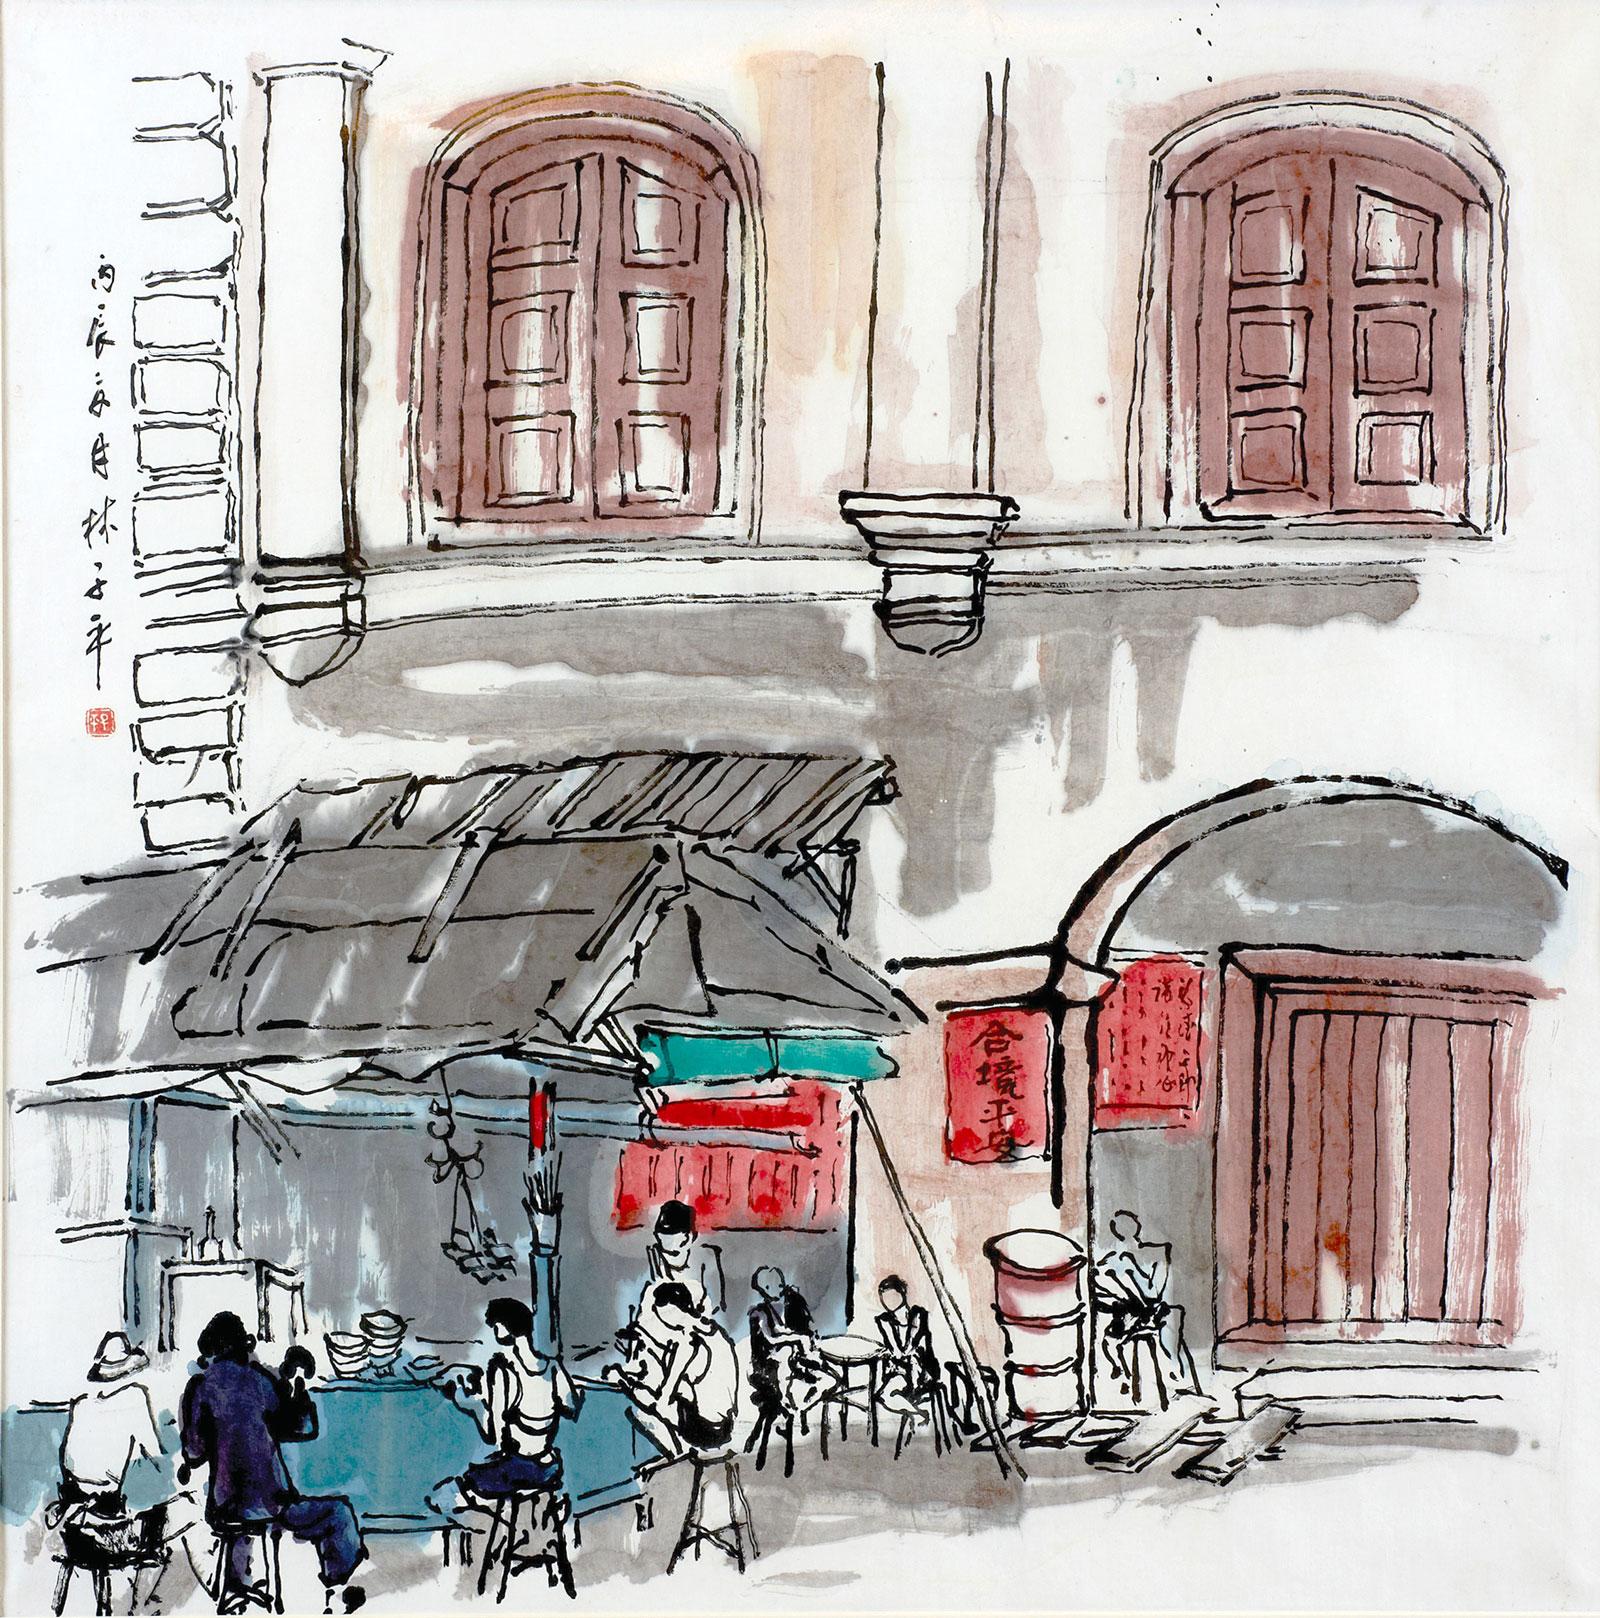 Lim Tze Peng-Market Place Ink on Paper